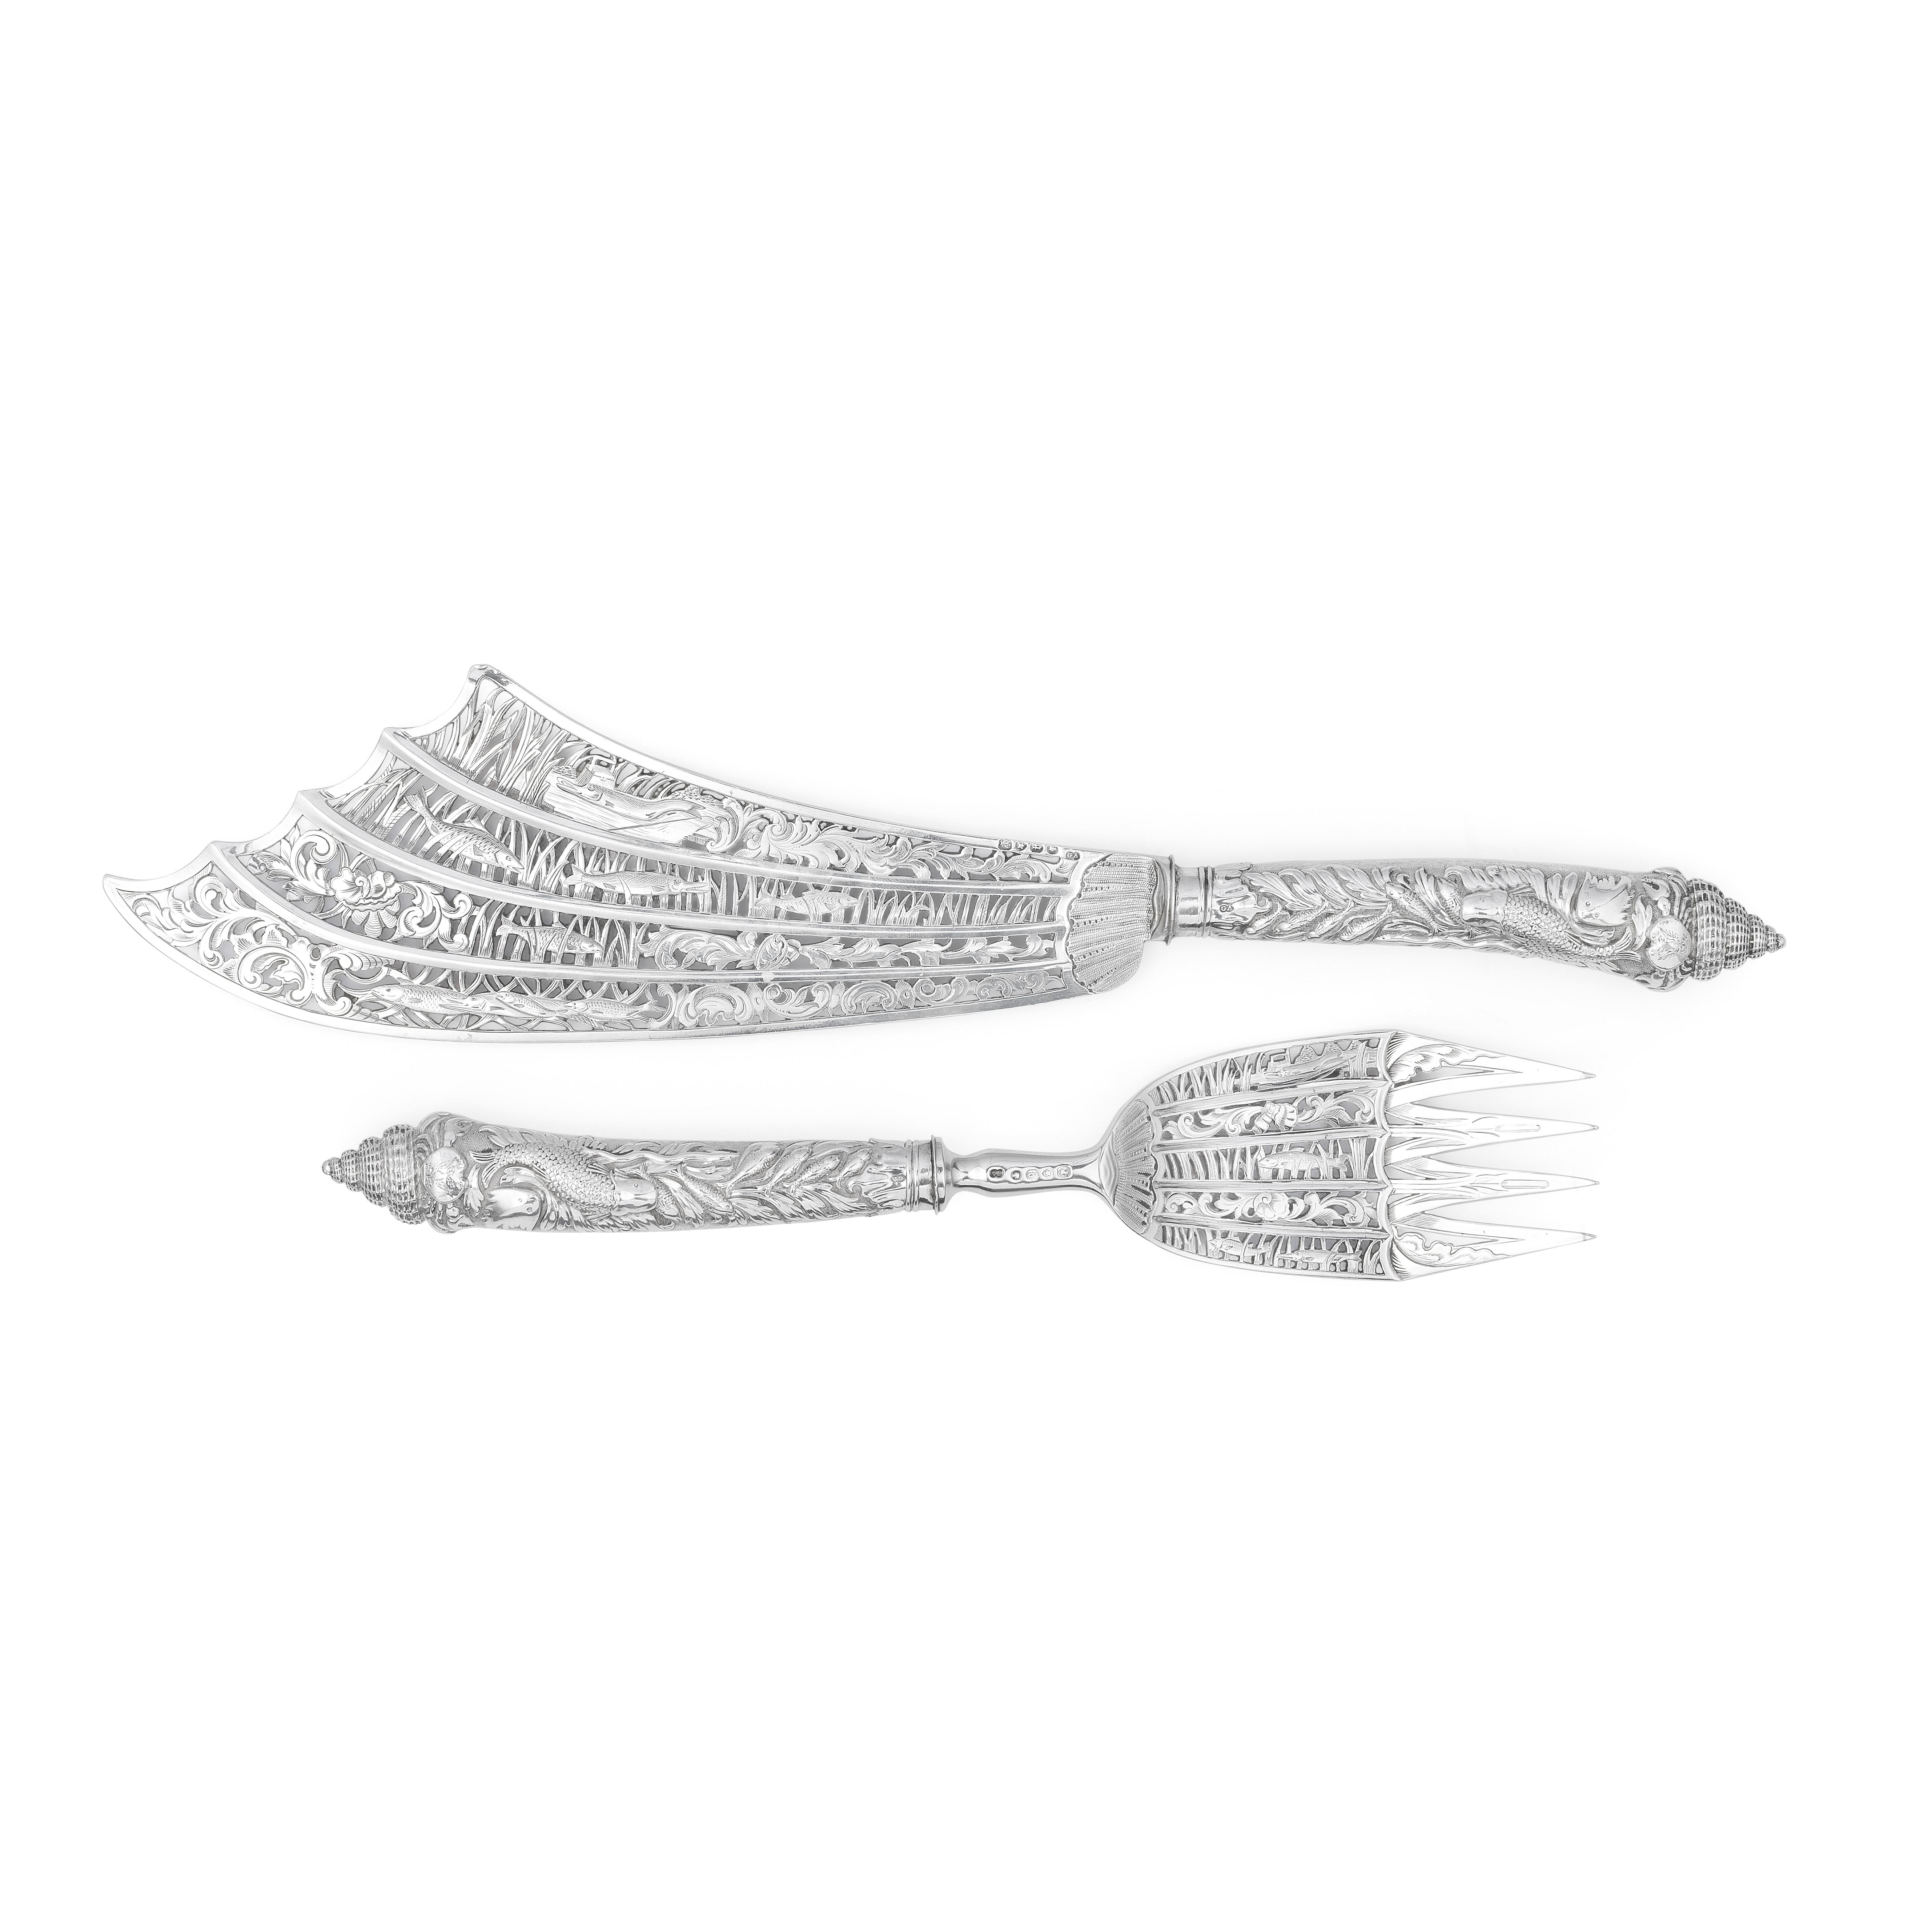 A good pair of Victorian silver cased fish servers George Adams, London 1857, handles 1856 (2)